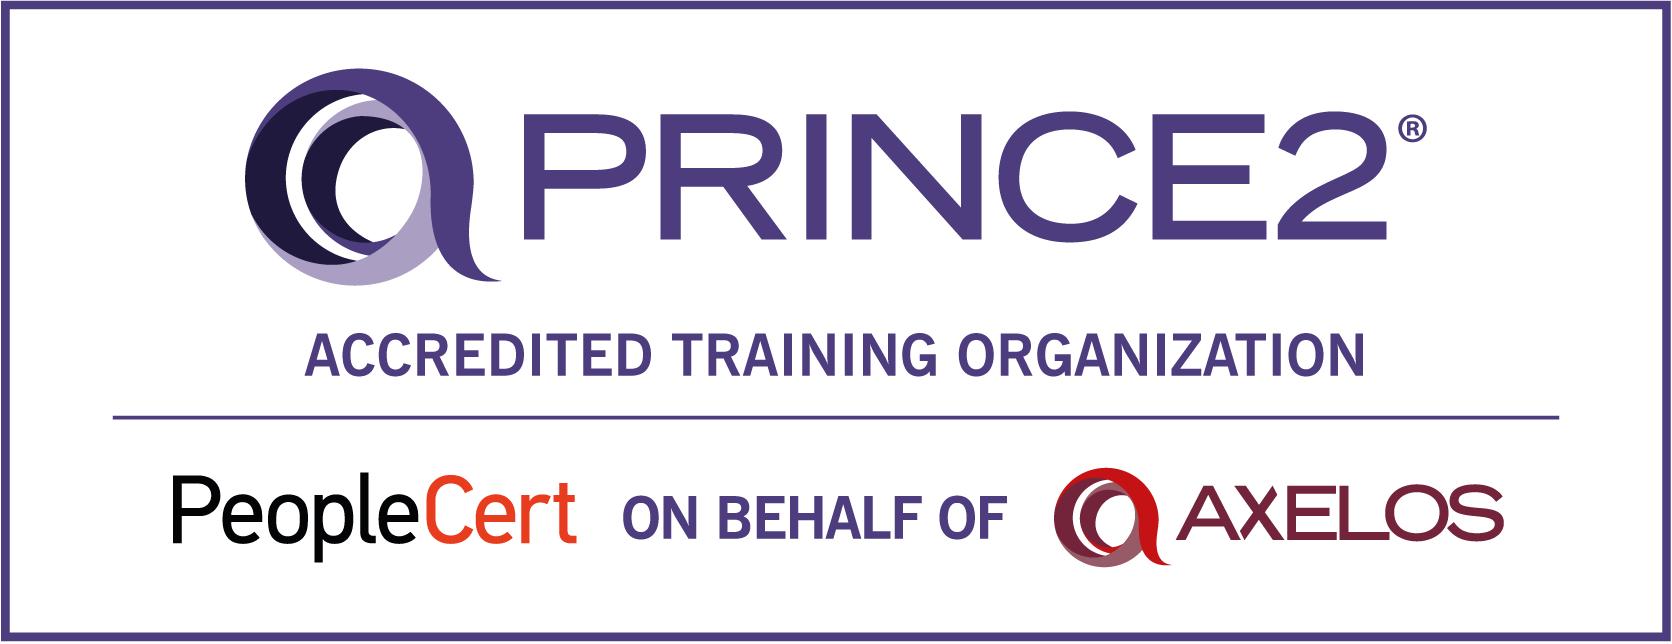 prince2 foundation, prince2 foundation certification, prince2 foundation course, prince2 foundation training, prince2 foundation exam